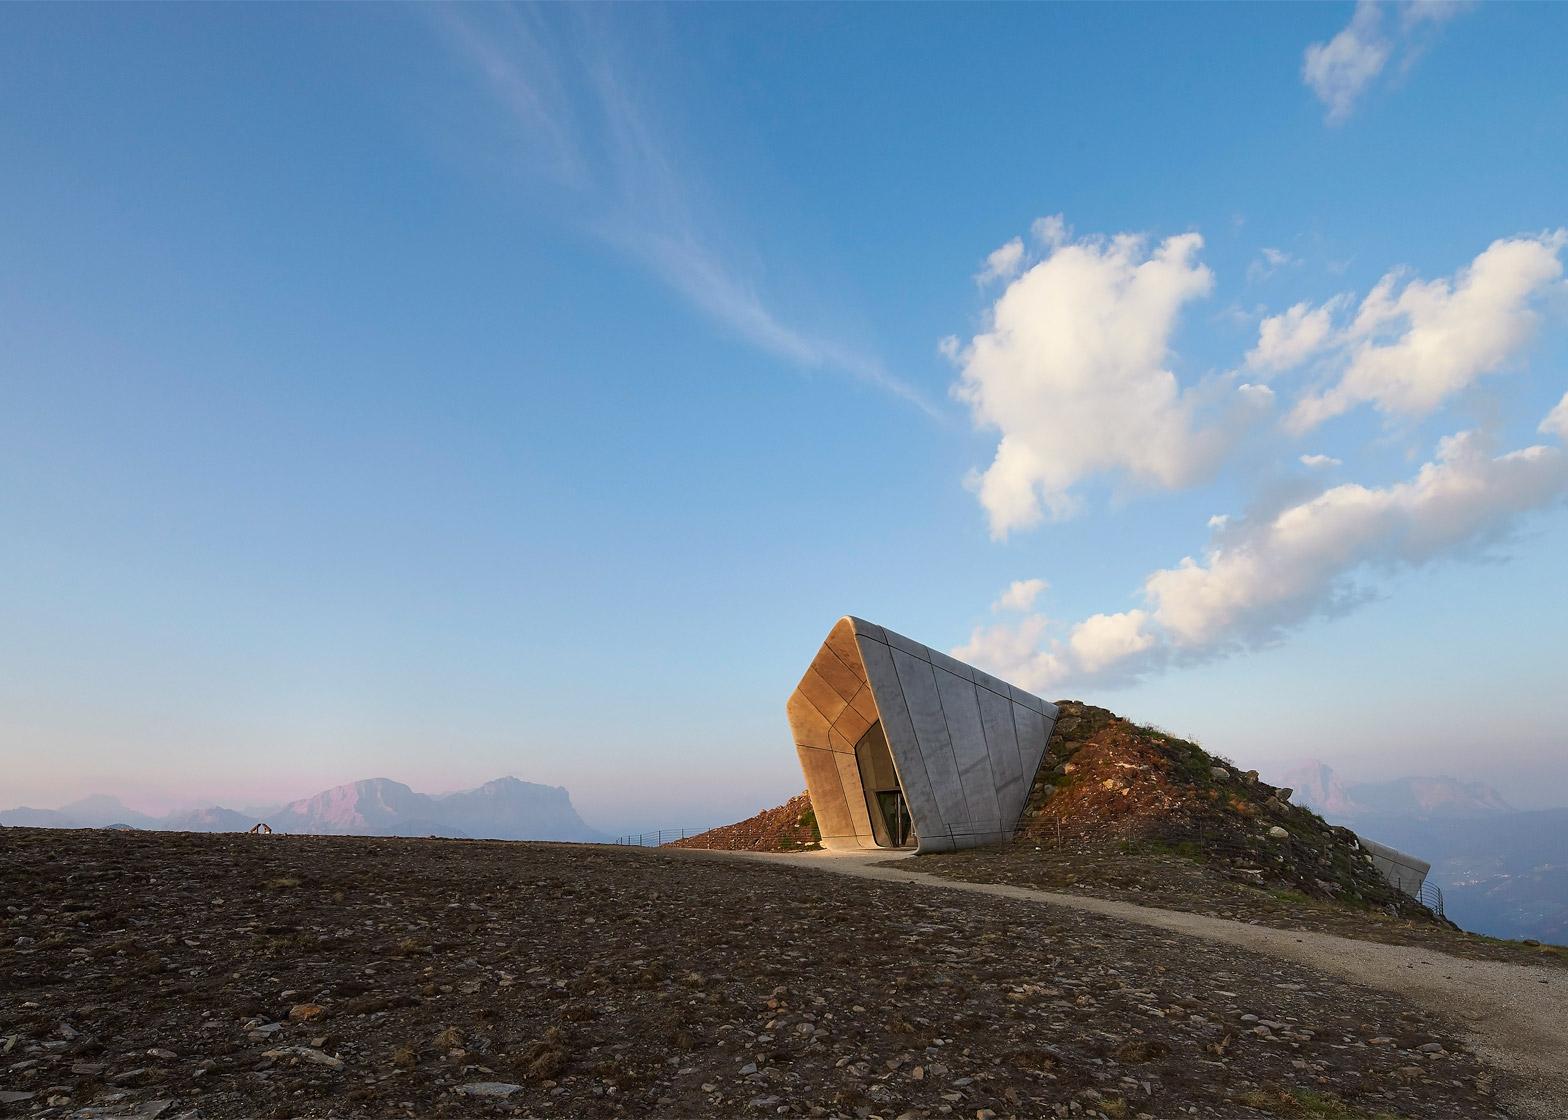 Messner Mountain Museum Corones, Italy, 2015